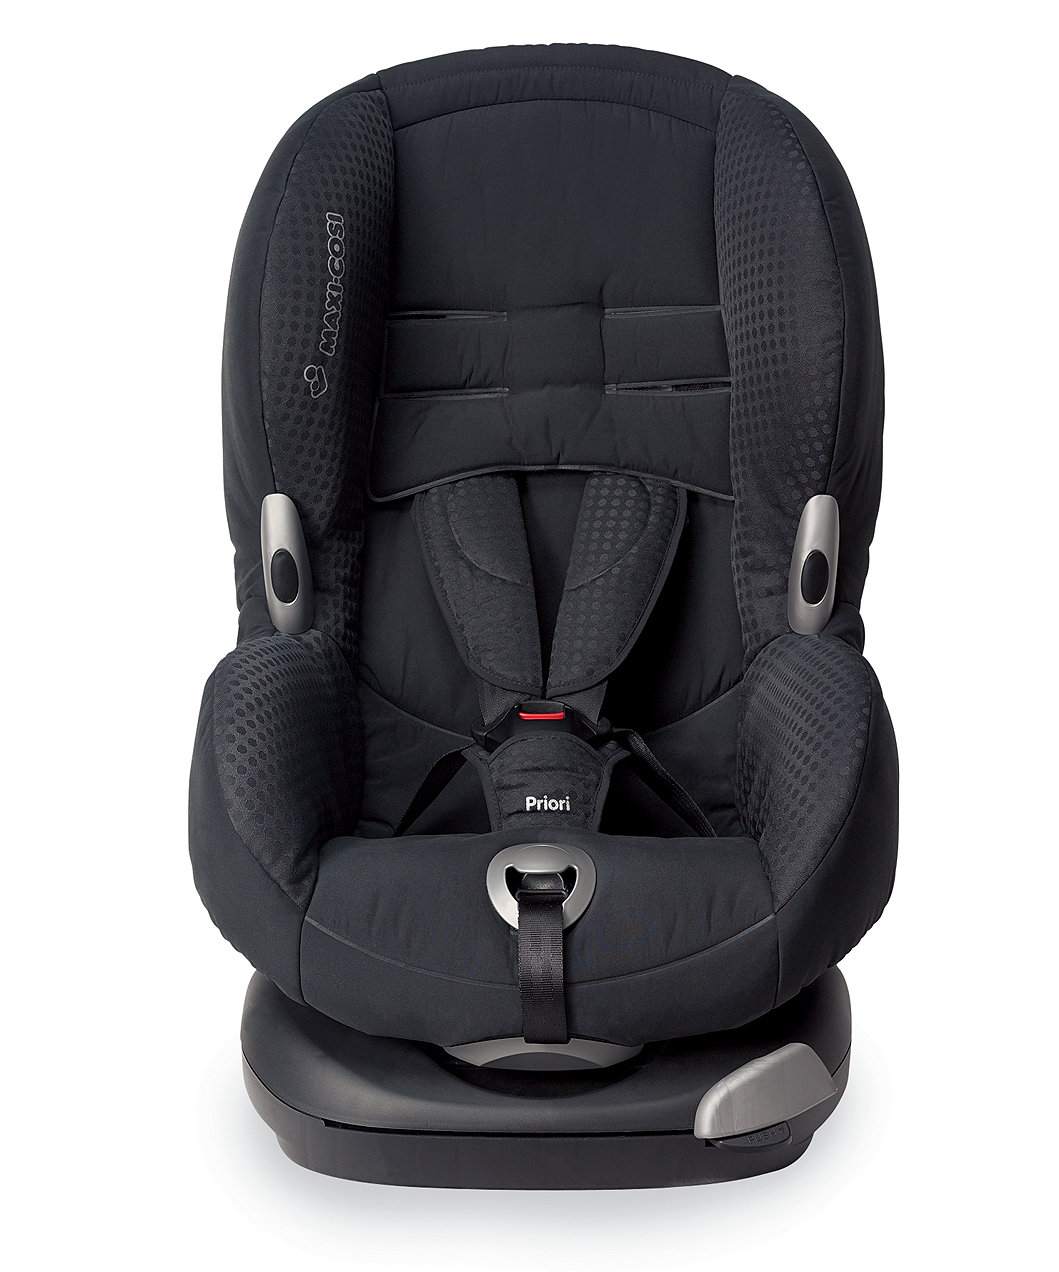 maxi cosi priori xp car seat black jacquard. Black Bedroom Furniture Sets. Home Design Ideas